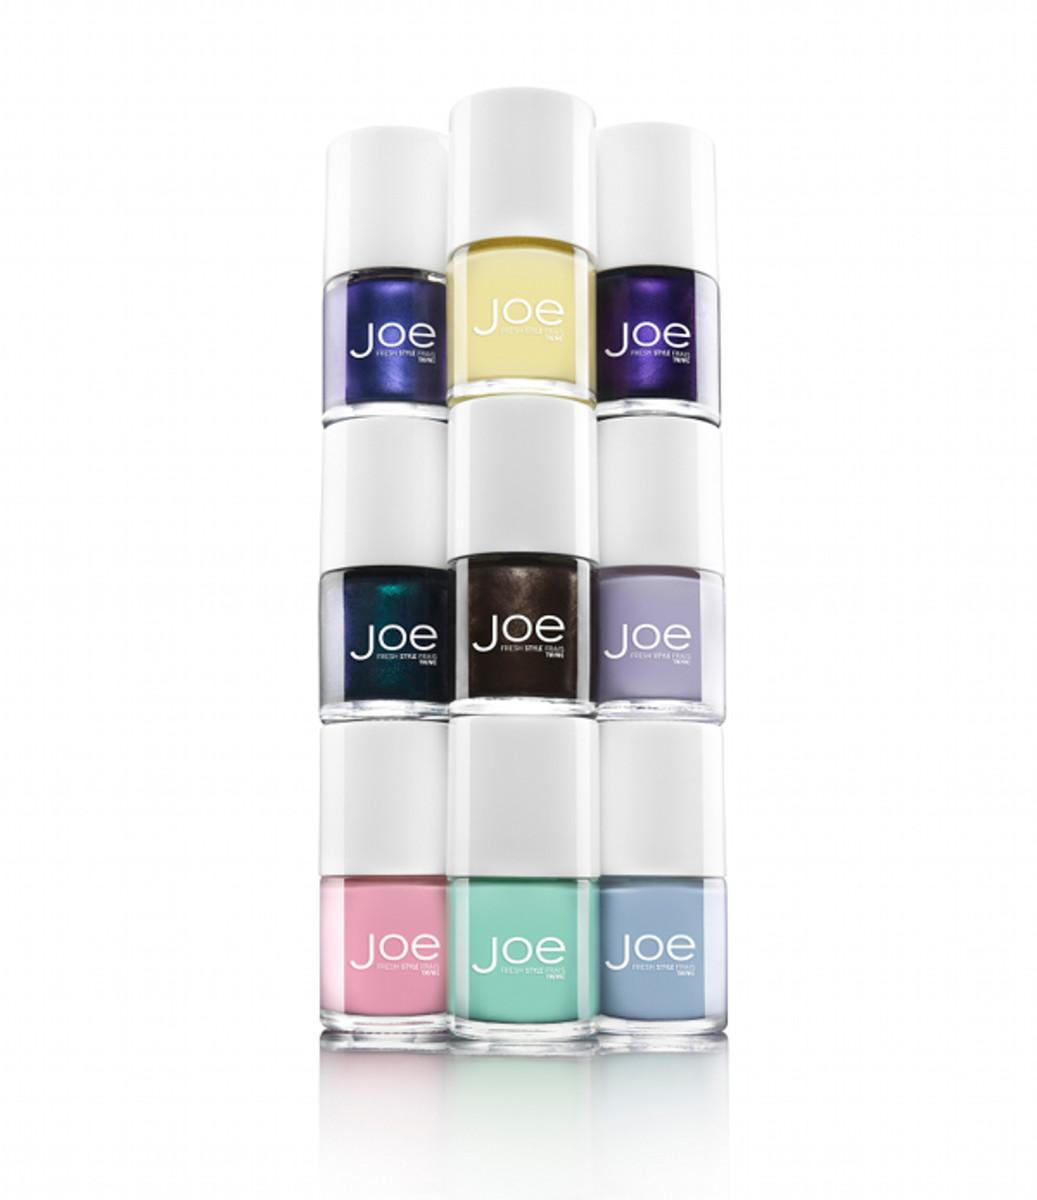 Joe-Nail-Polish-Spring-2010-Colours